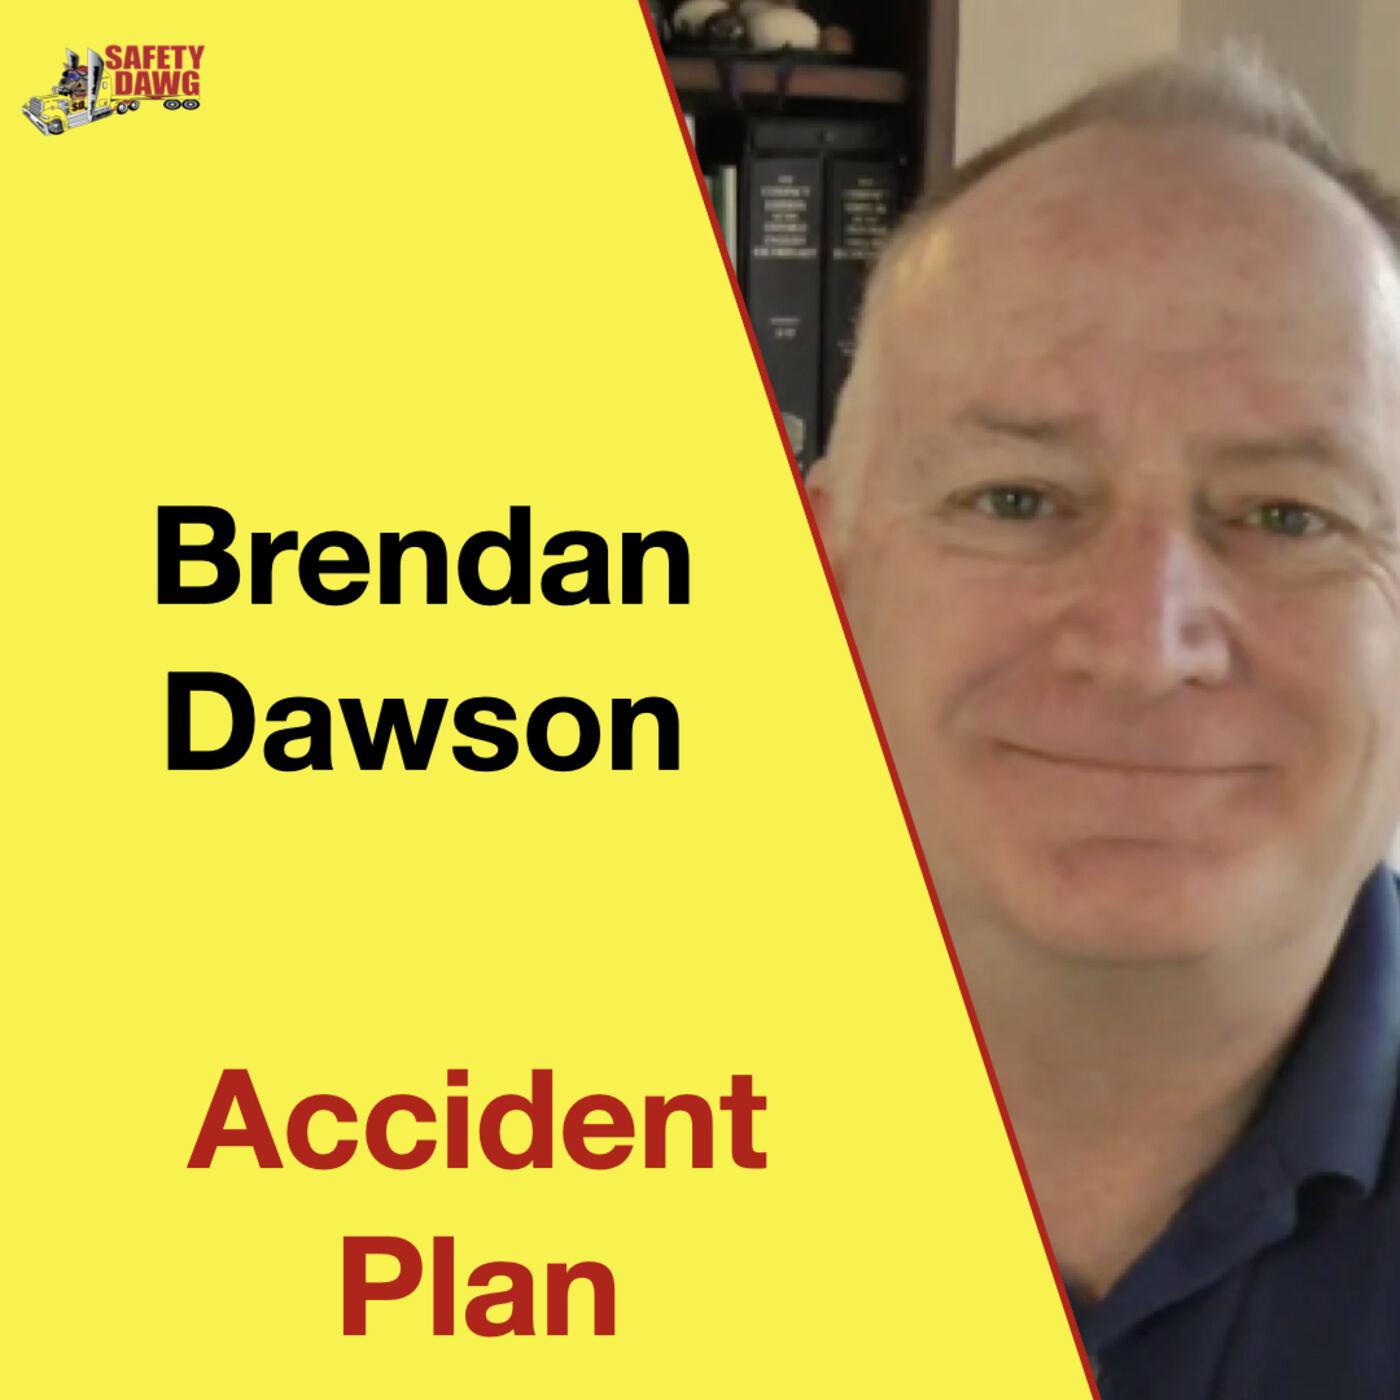 Brendan Dawson, Accident Plan